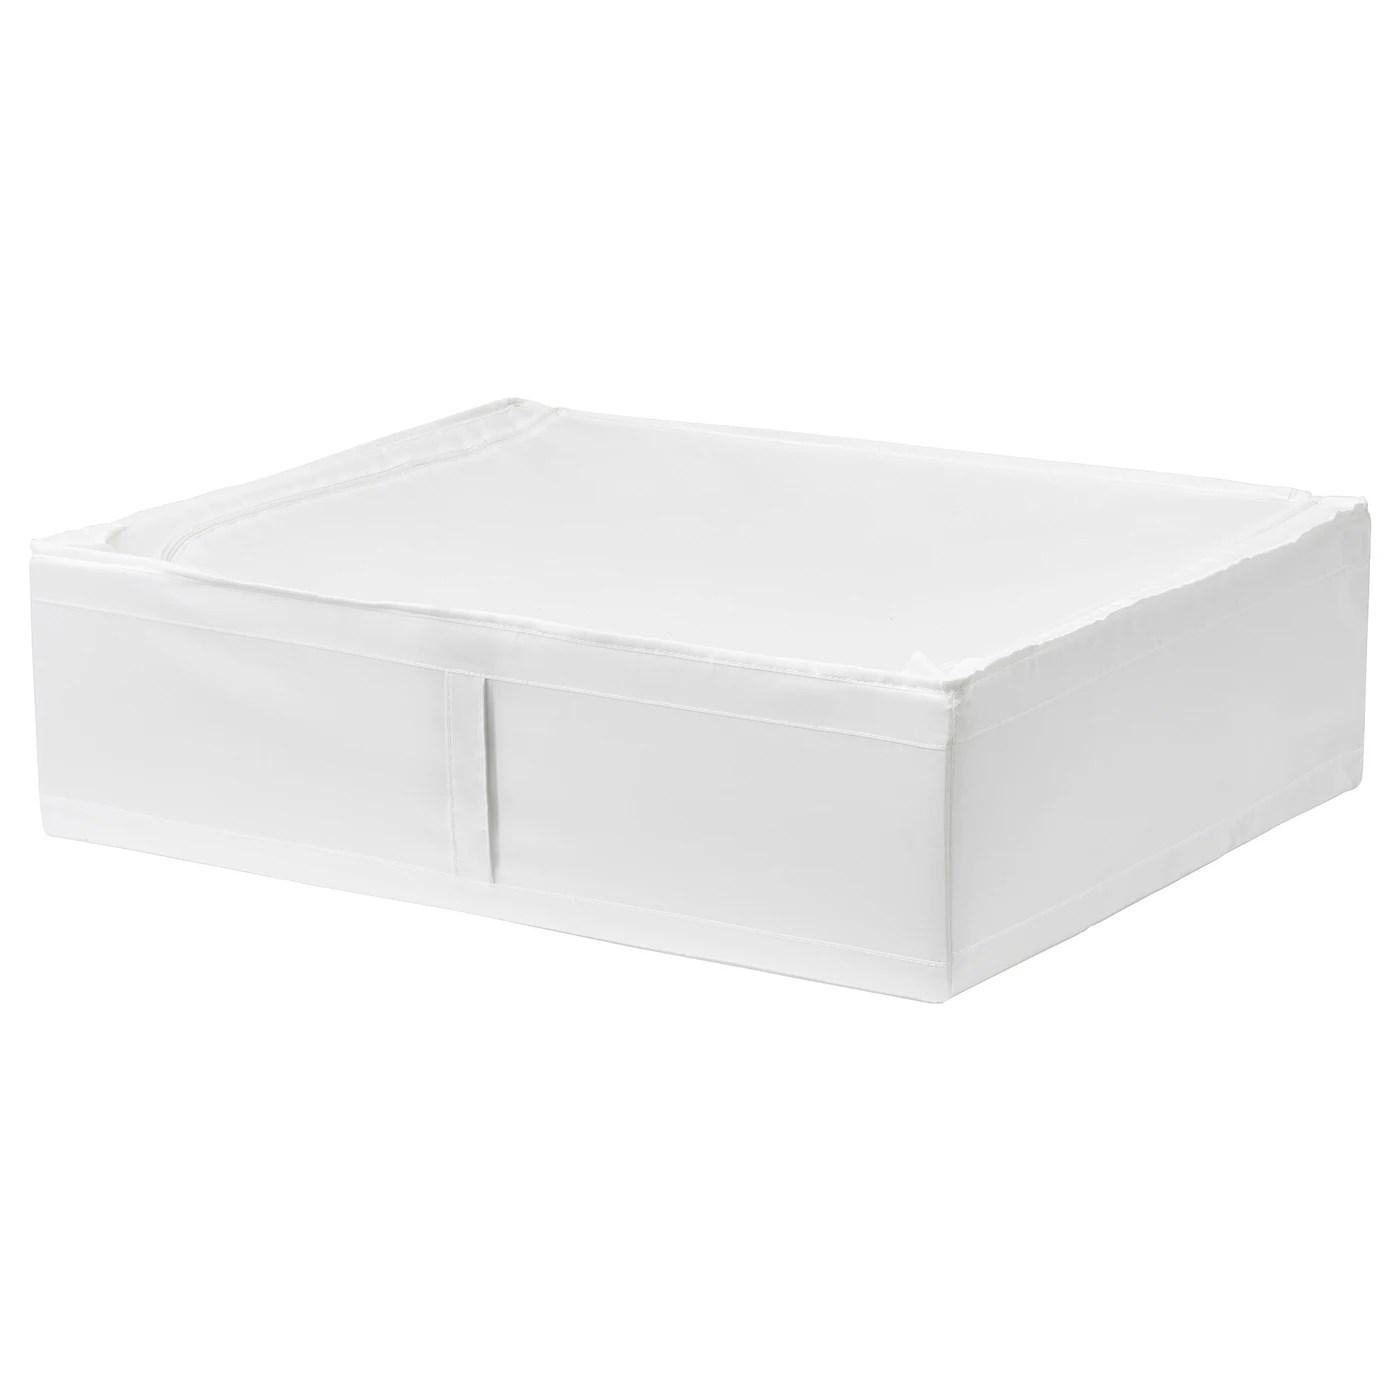 Skubb Sac De Rangement Blanc 69x55x19 Cm Materiau Durable Ikea